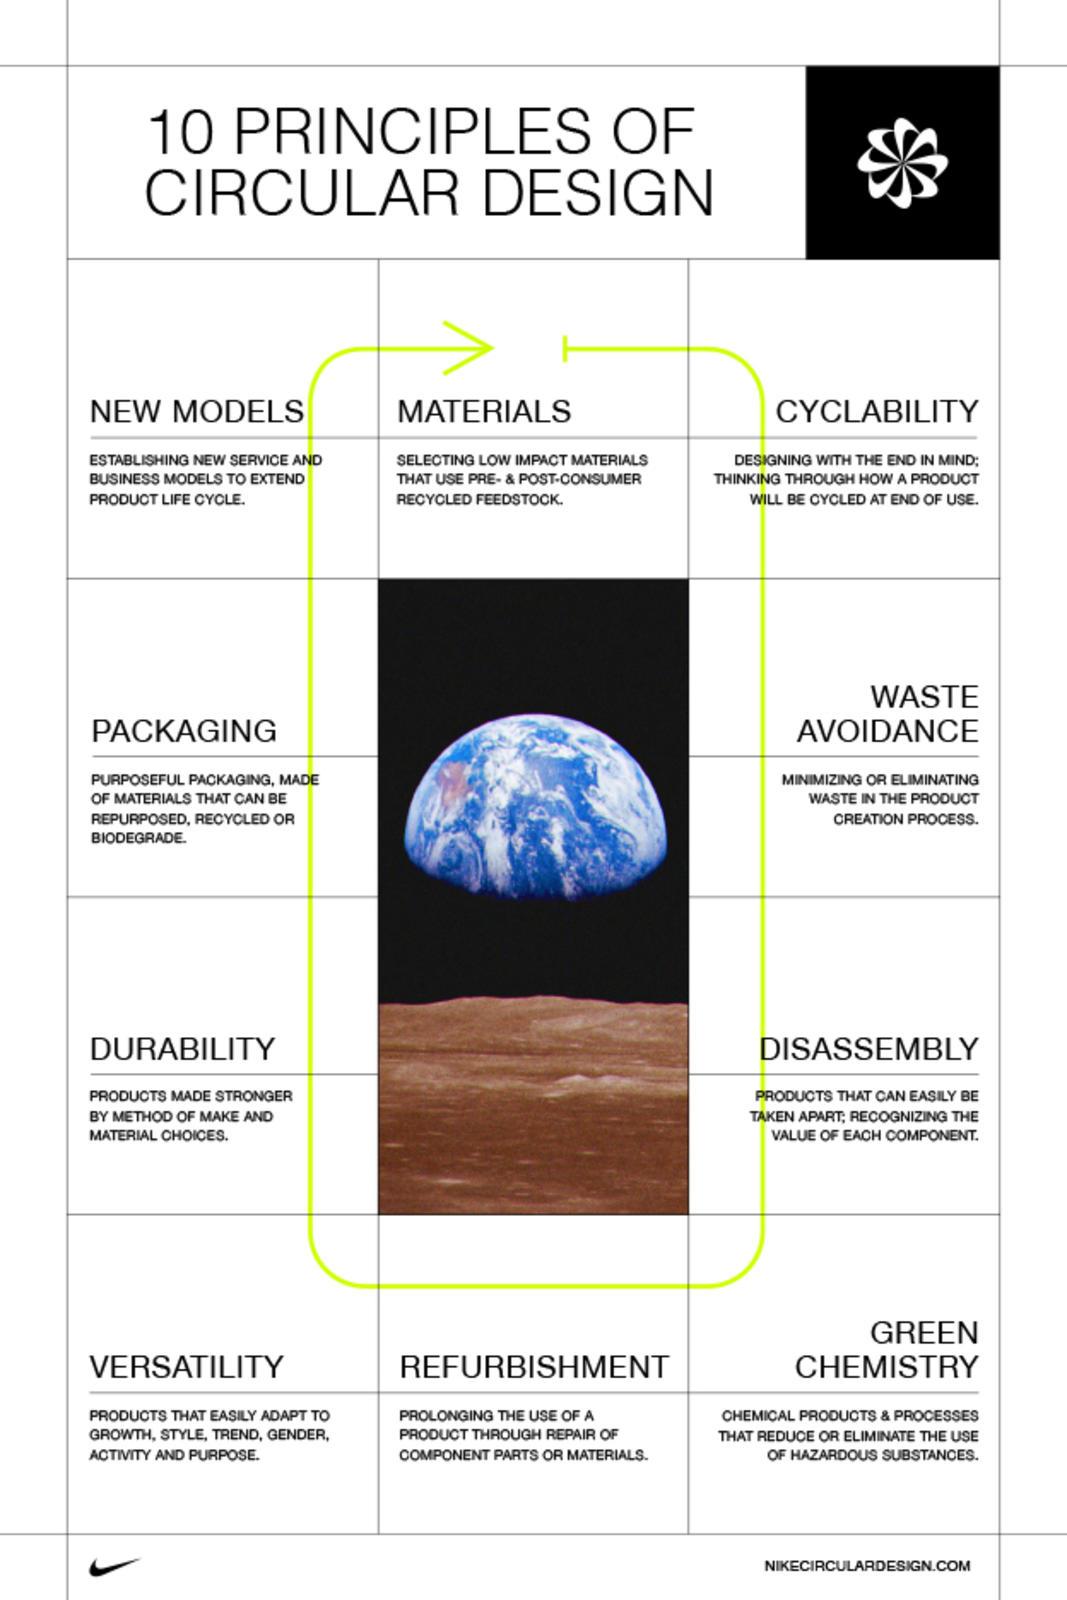 prisa pegamento vertical  Nike Circular Design Workbook - Nike News